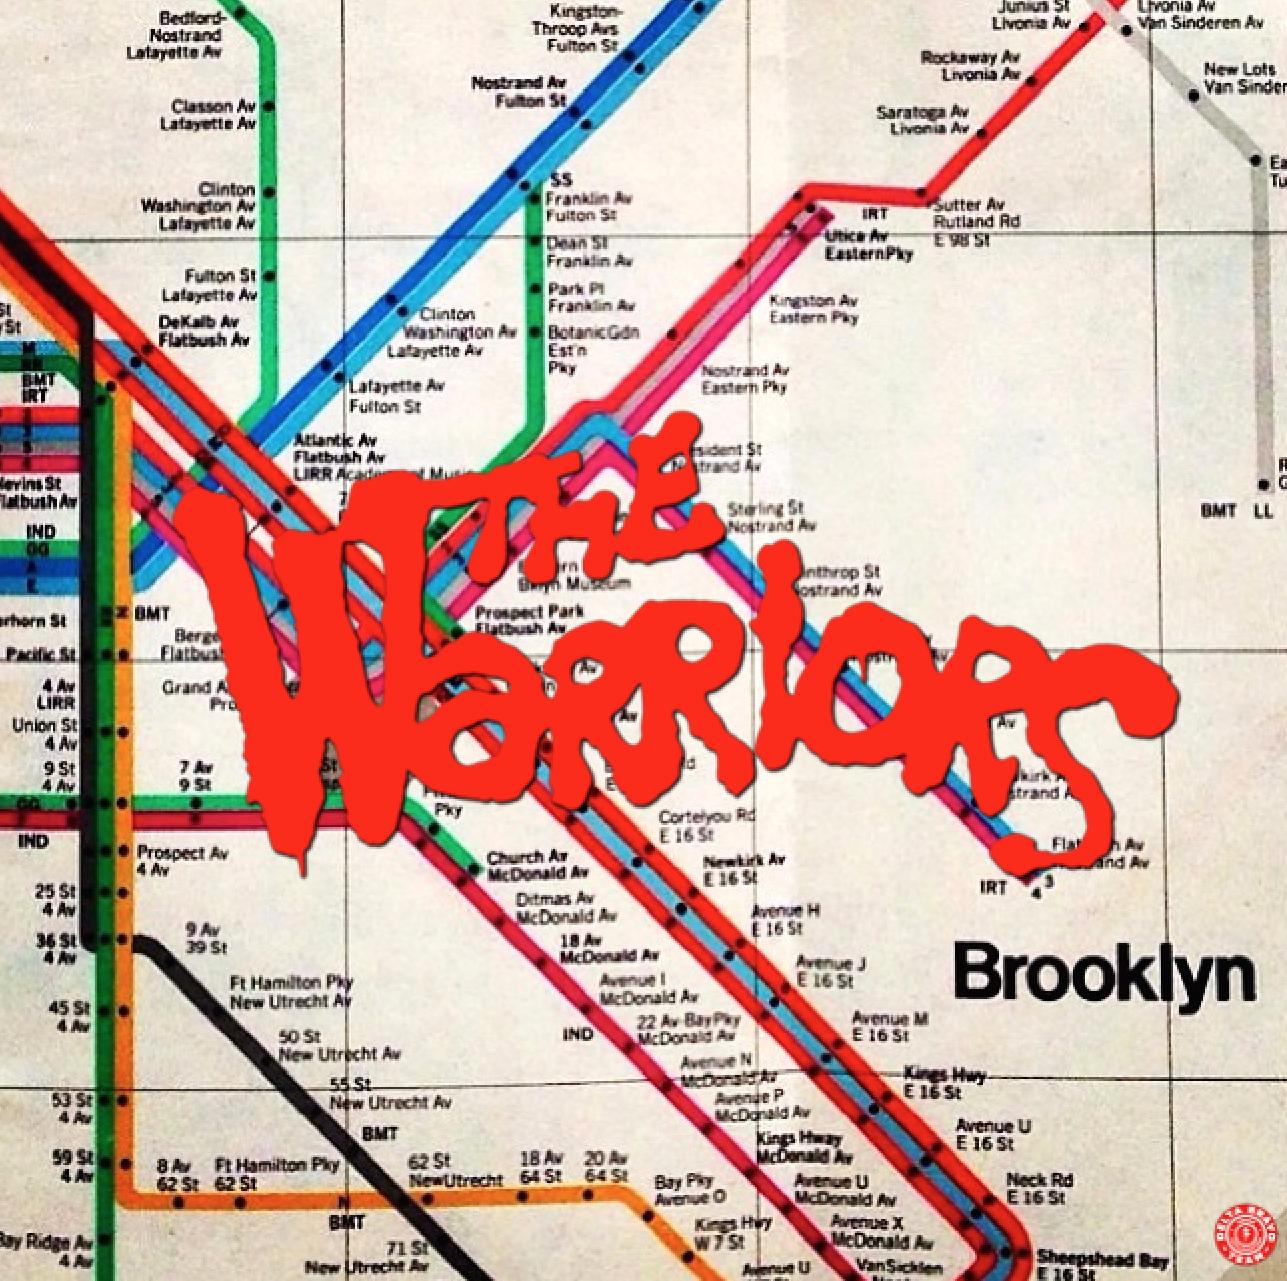 Nyc 70s Subway Map.Massimo Vignelli R I P Legendary Designer Of The Iconic Yet